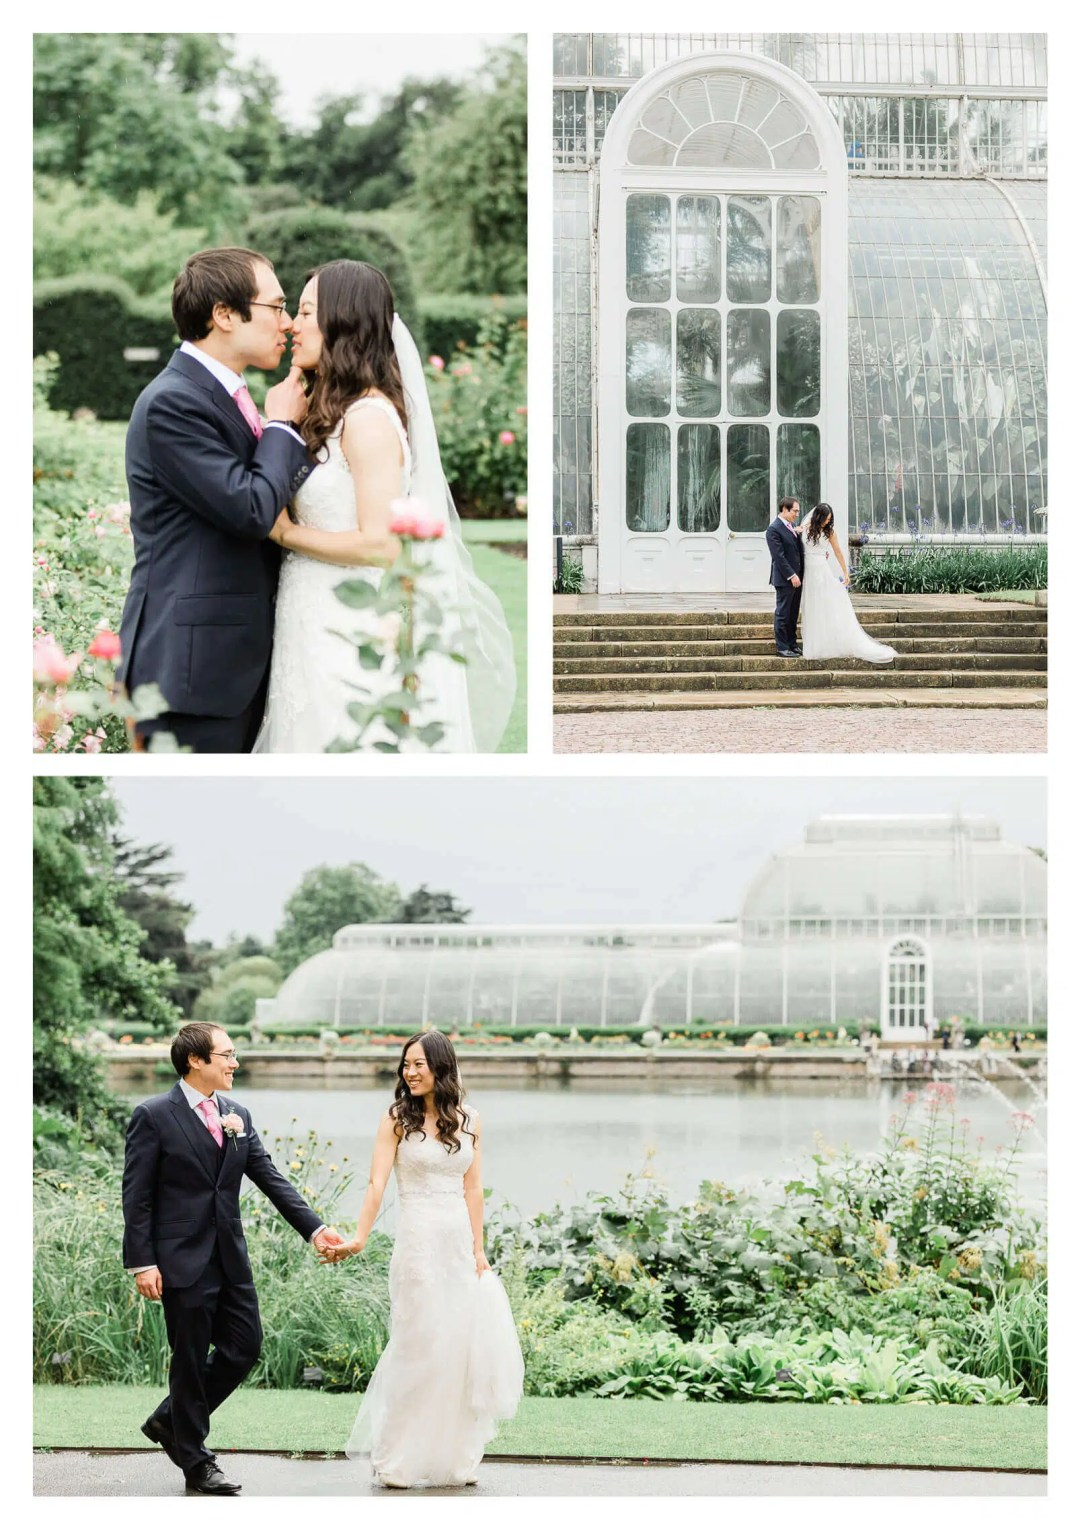 Kew Garden wedding couple portraits in rose garden   London photographer